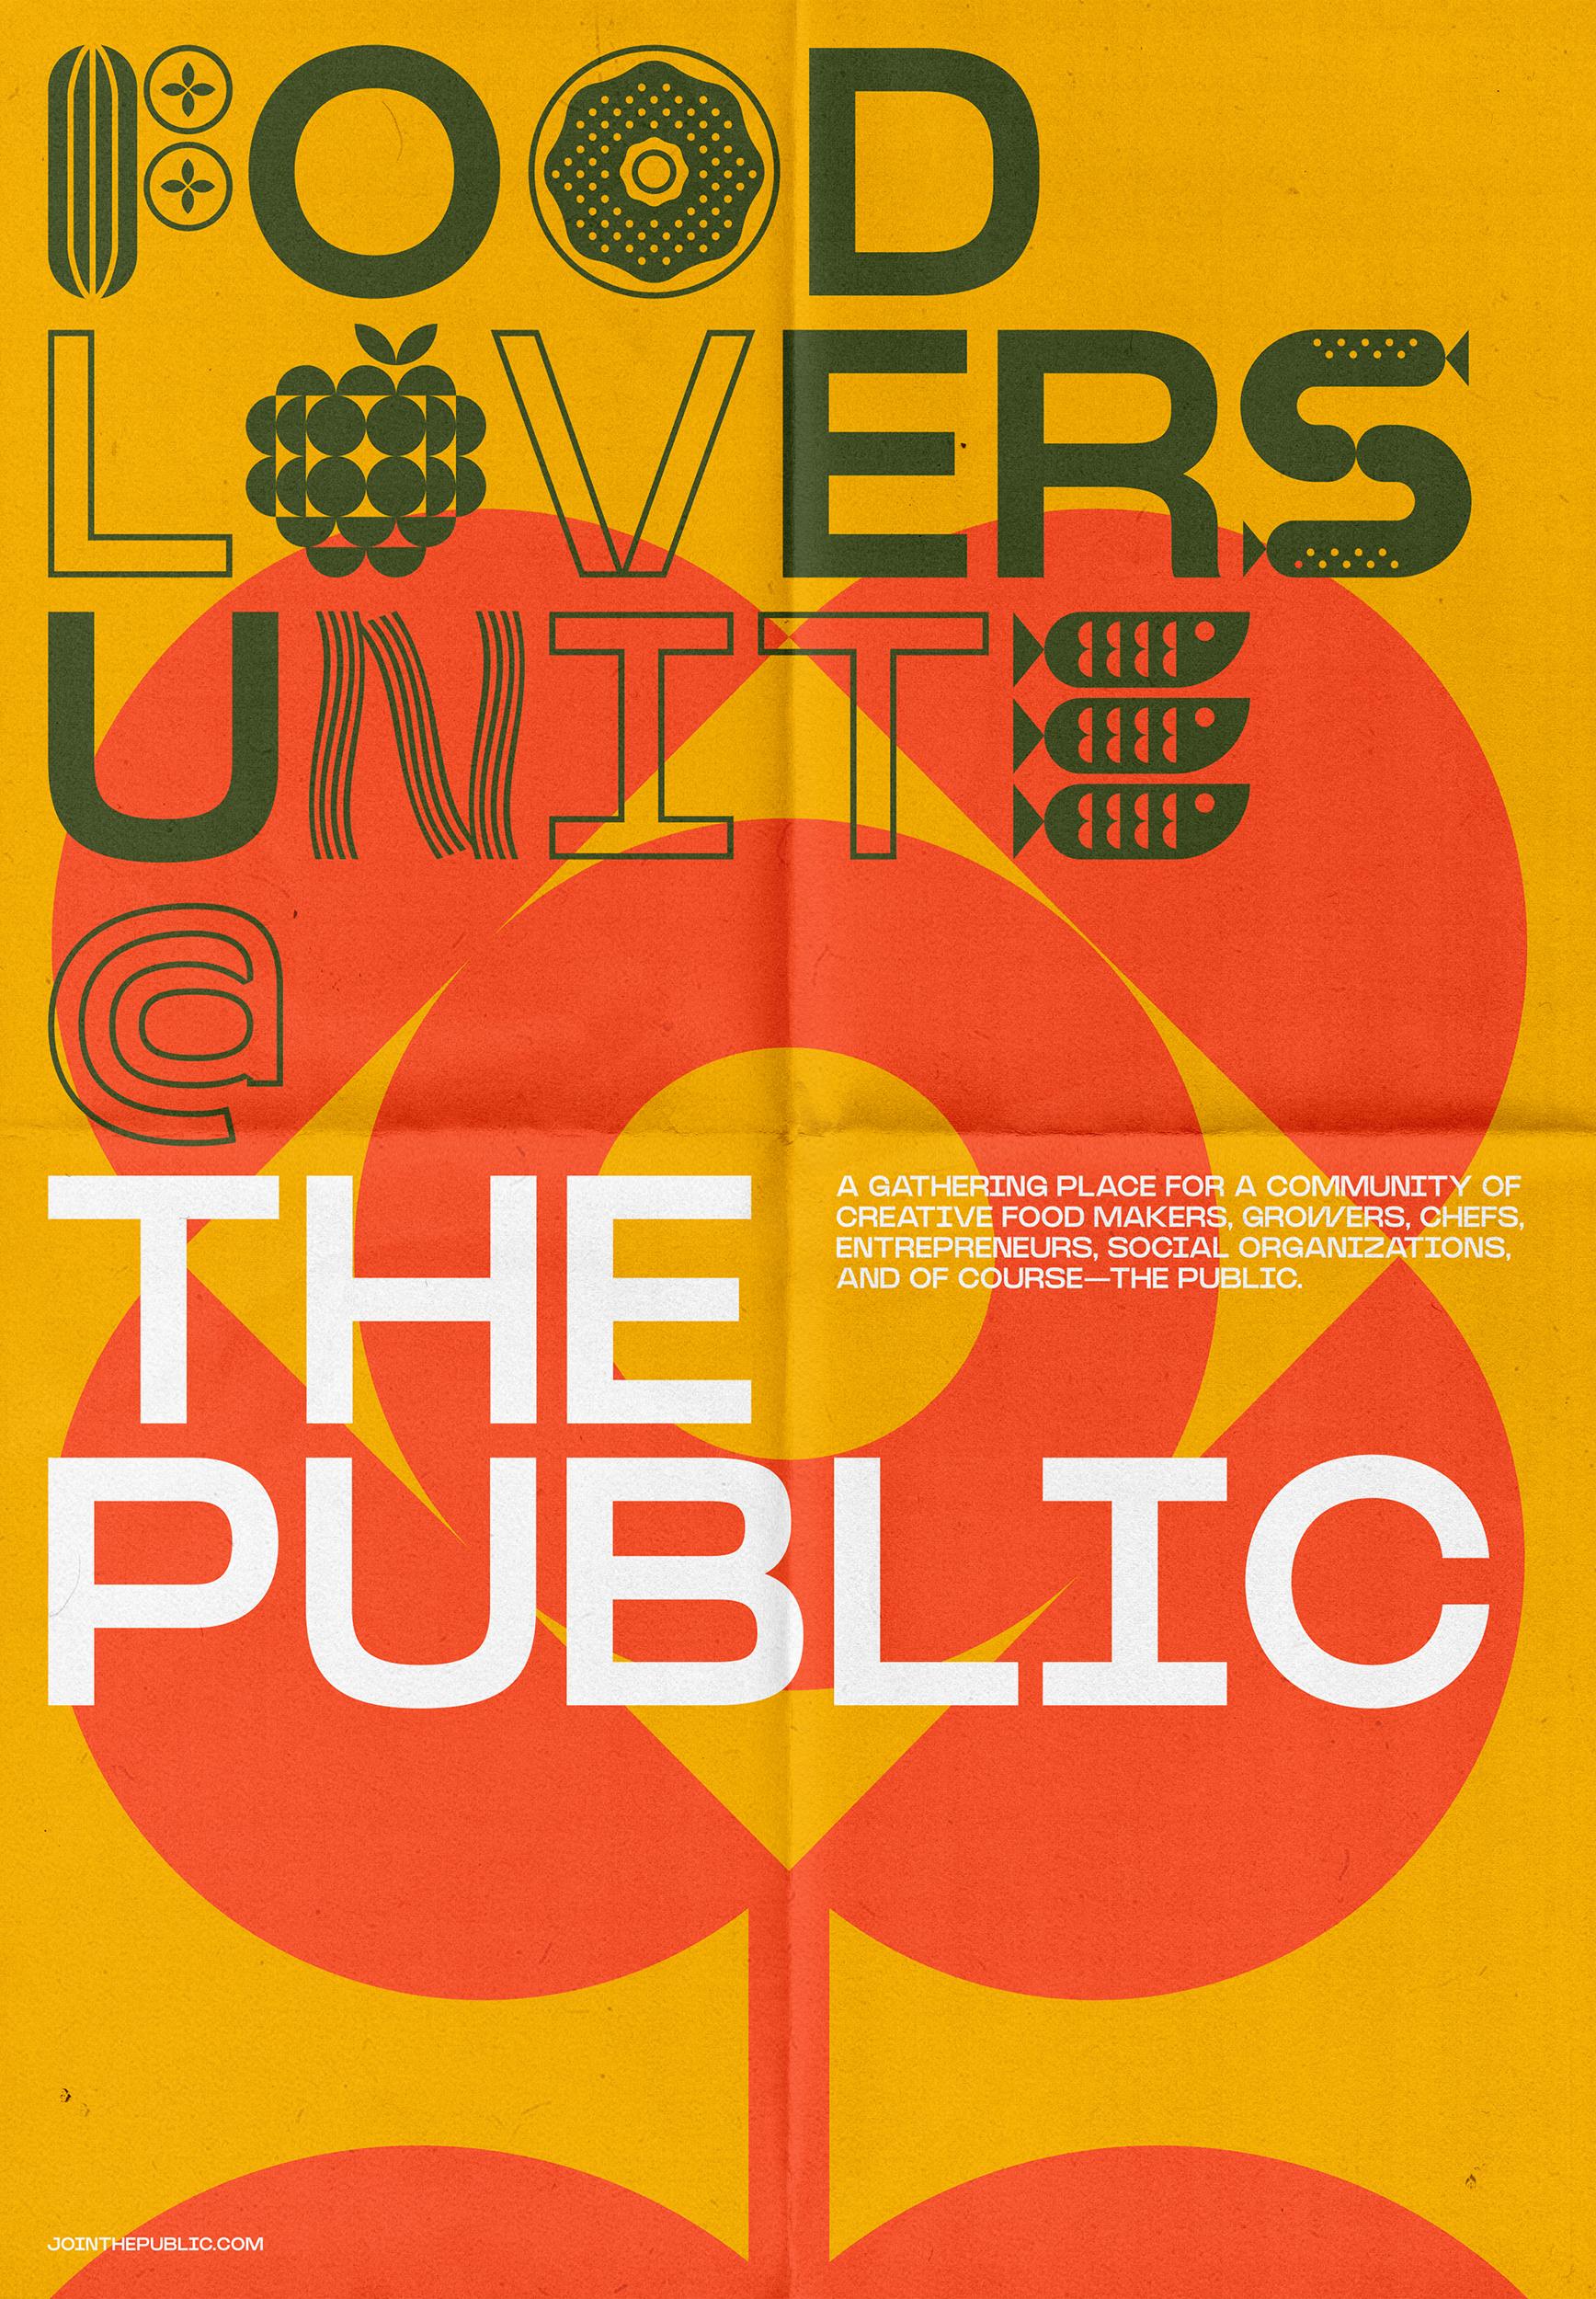 PUBLIC-Poster-3B.jpg